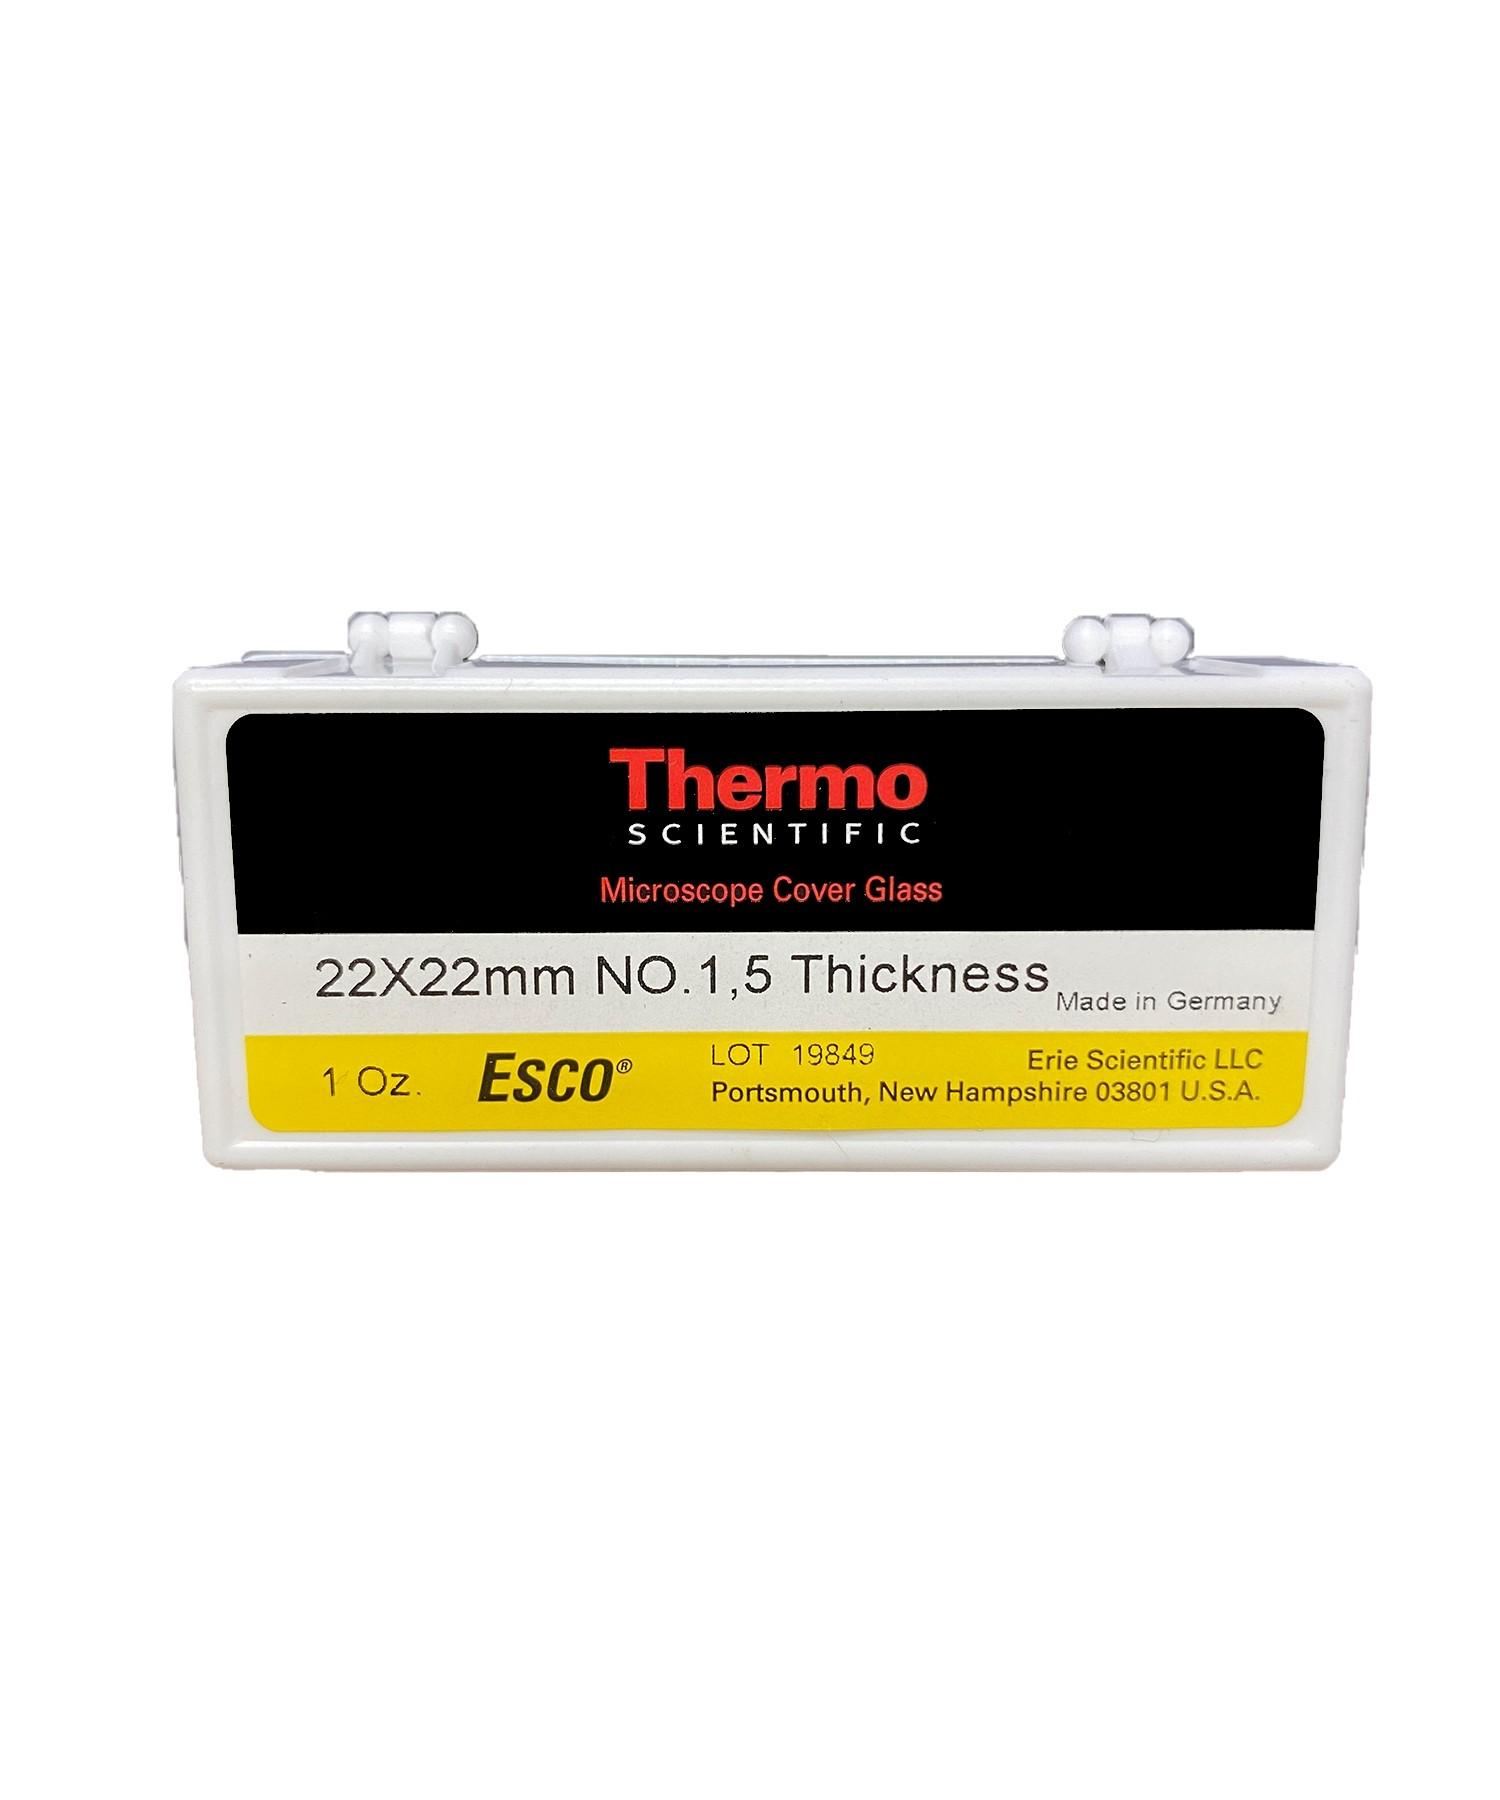 22 x 22mm Cover Glass, #1.5, Esco/Epredia (10 1 OZ Boxes)